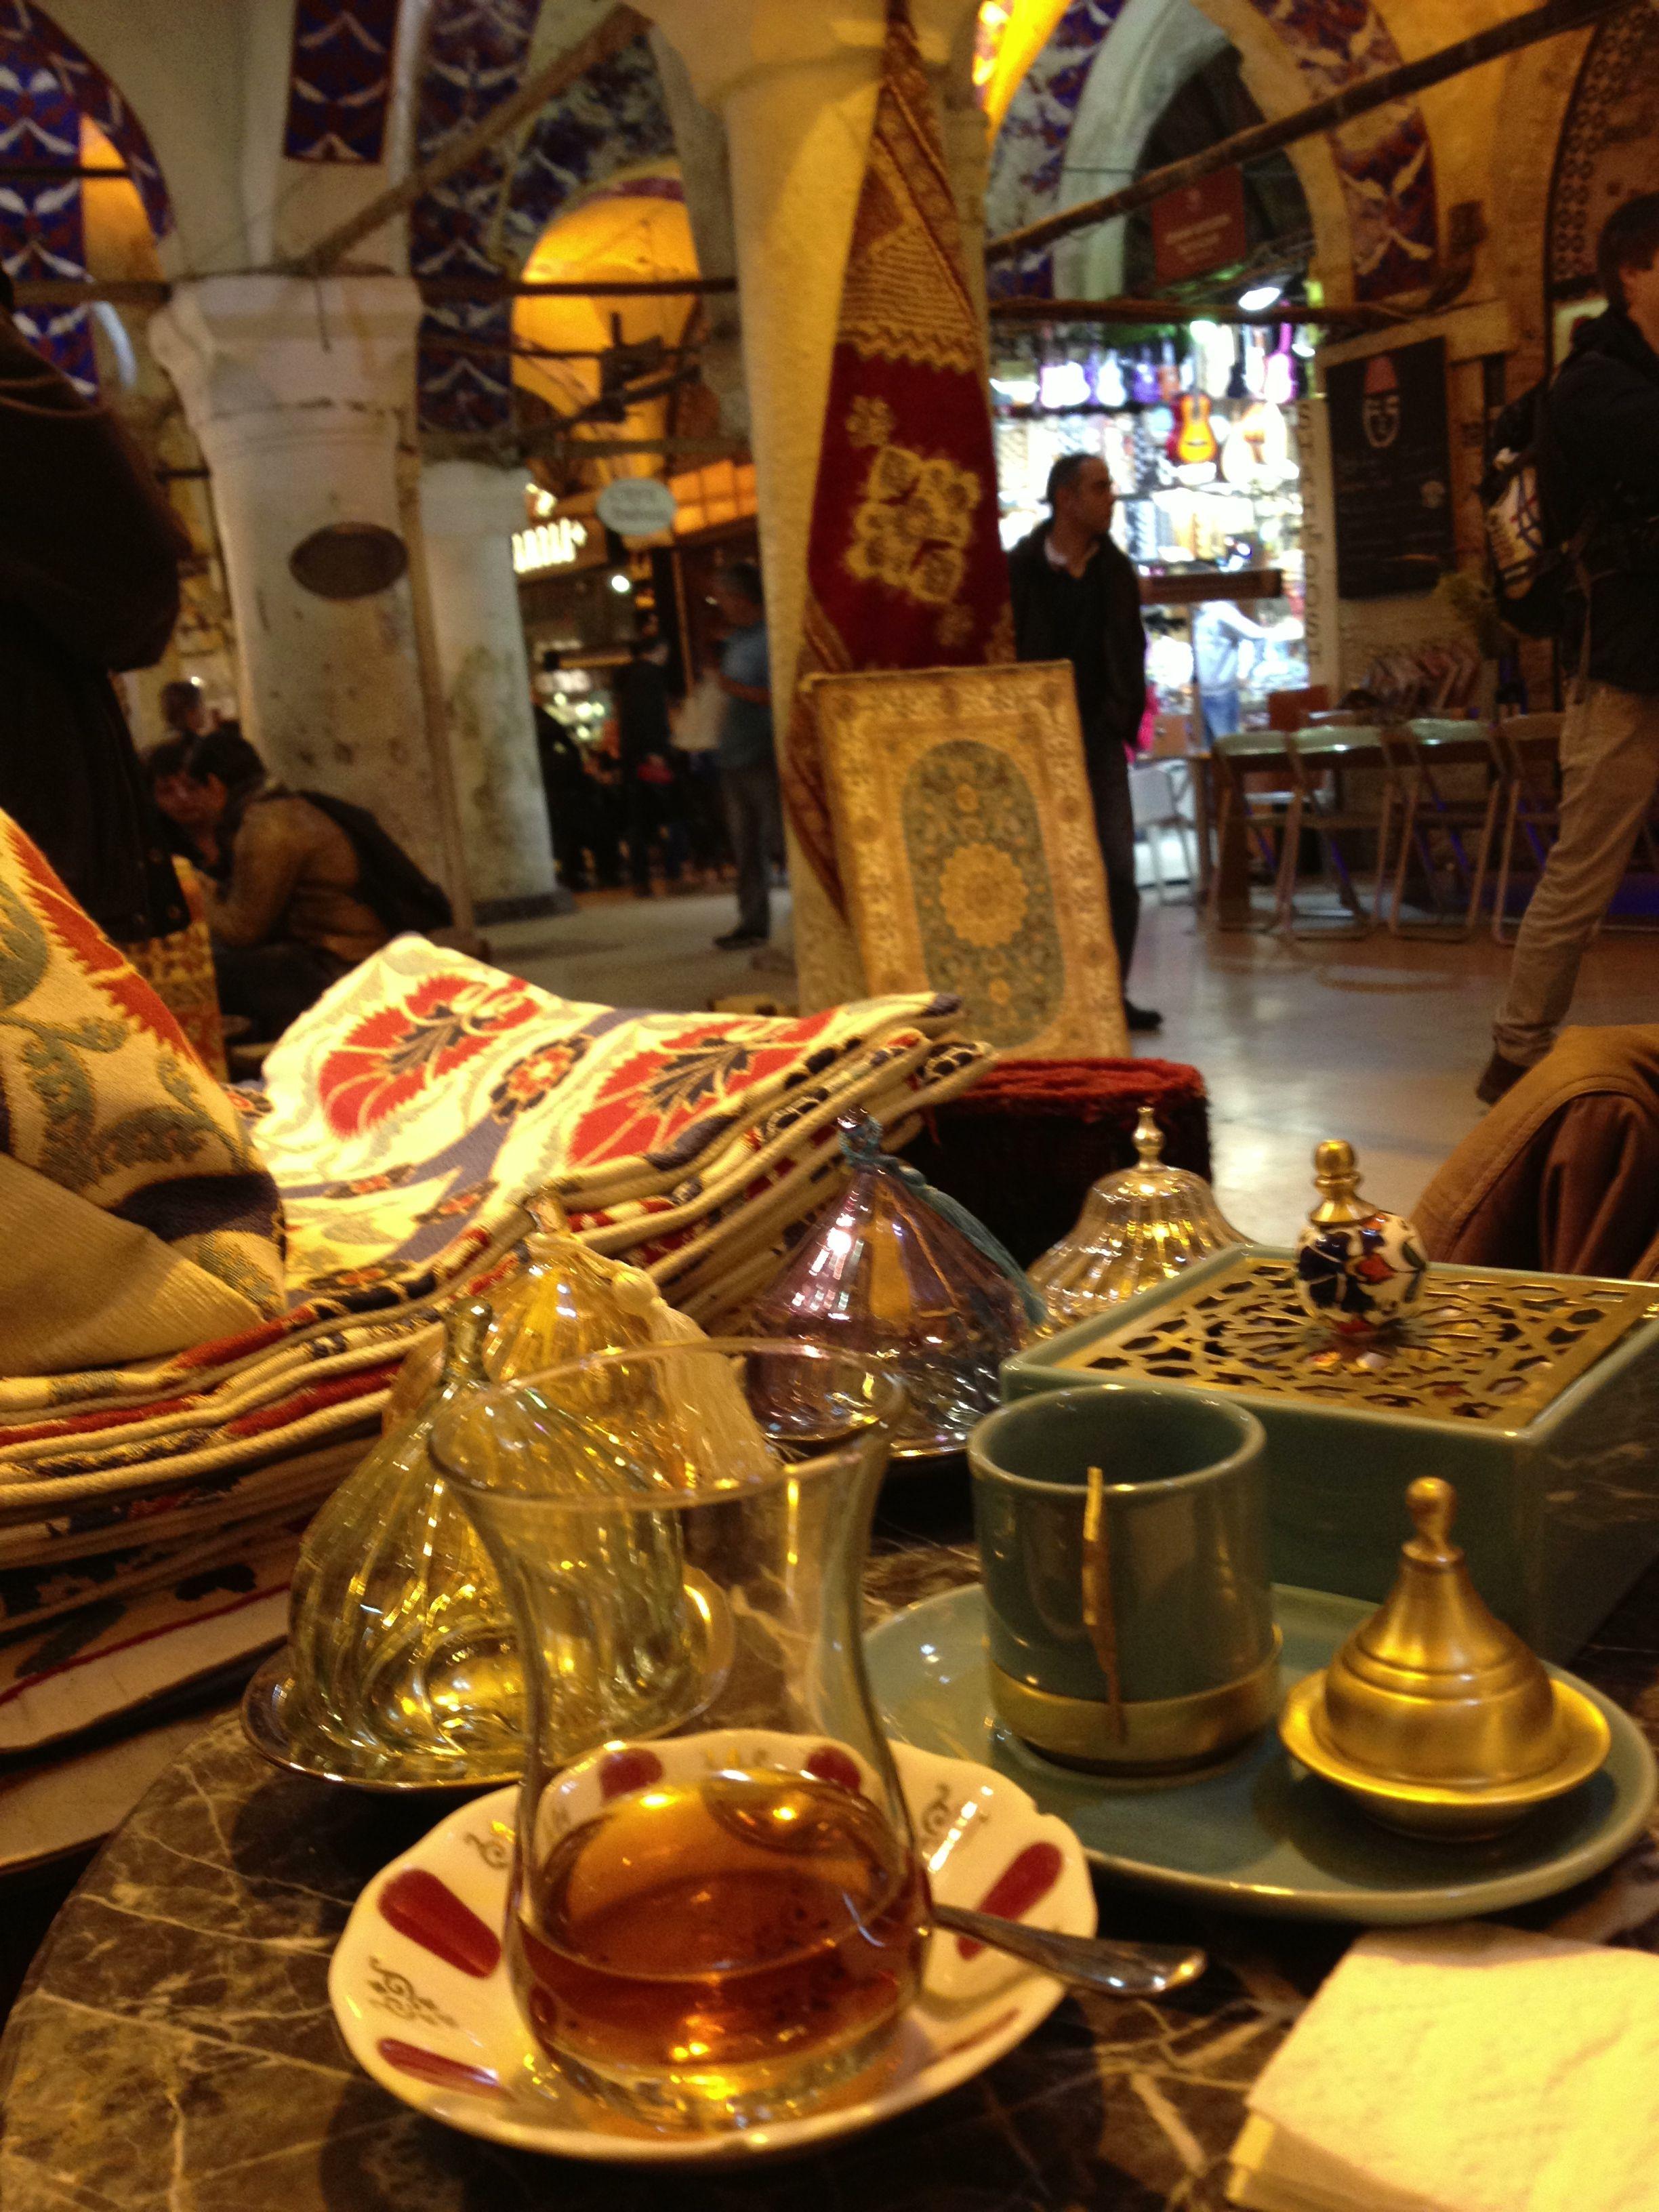 Turkish Tea at Kapalicarsi Istanbul Grand Bazaar